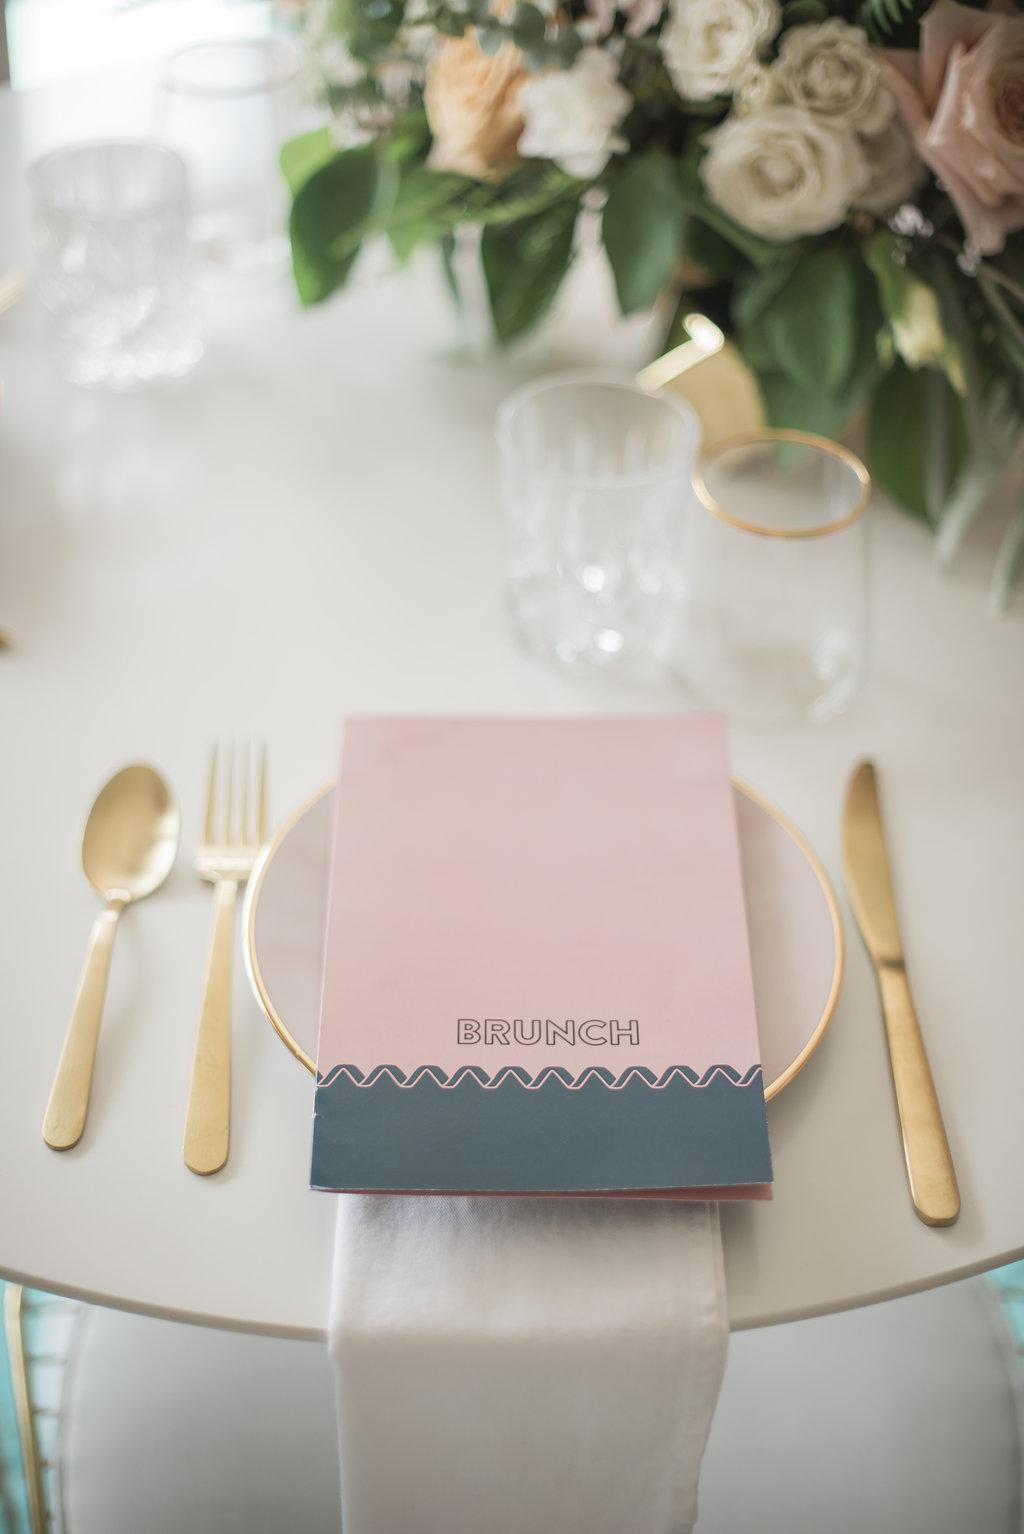 Motel-Restaurant-Editorial-Vineyard-Bride-photo-by-Blynda-DaCosta-Photography-015.JPG